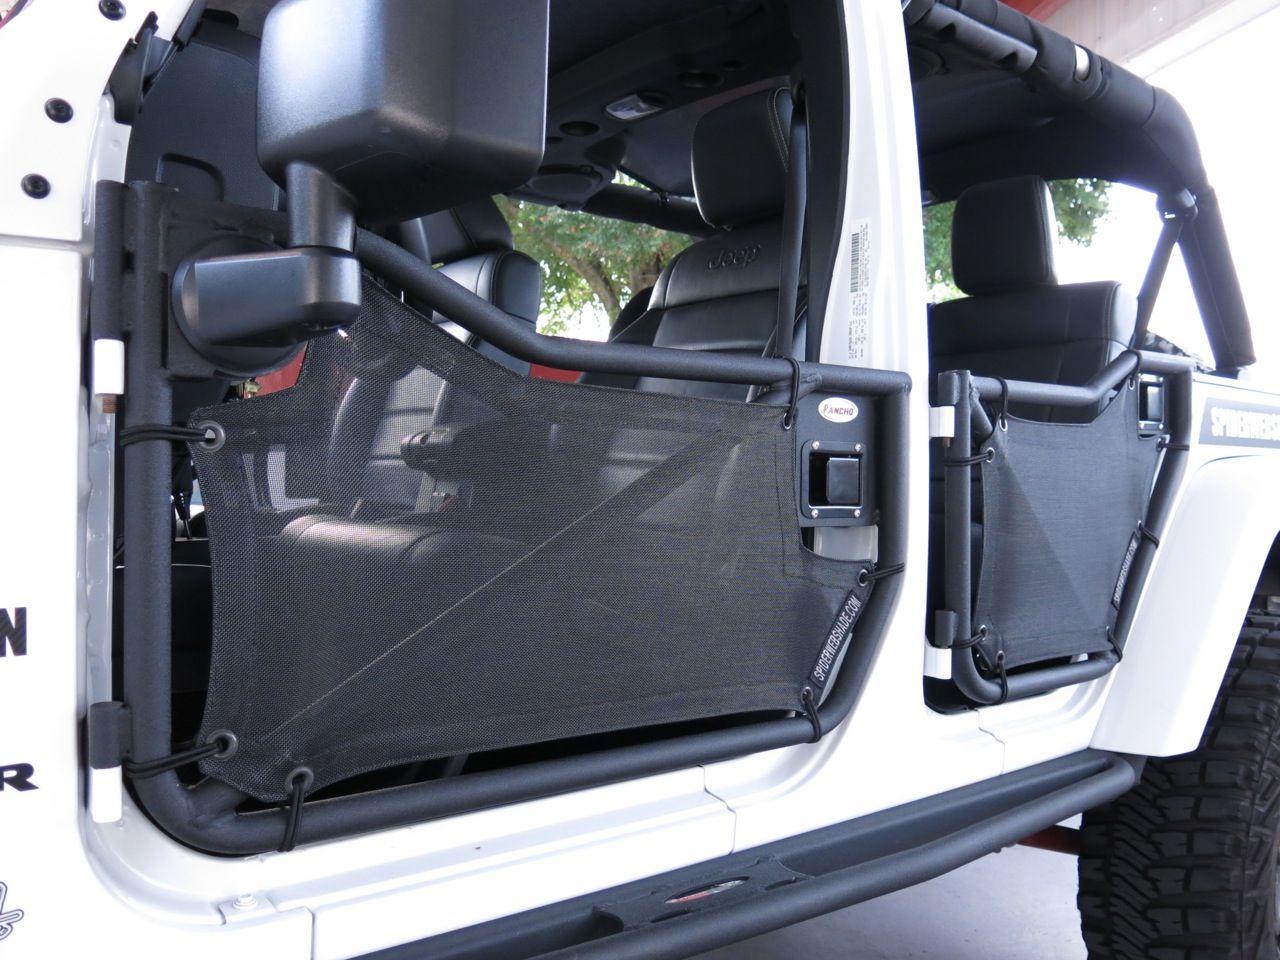 Jk 4d Shadeskins Jeep Accessories Wrangler Accessories Jeep Wrangler Accessories